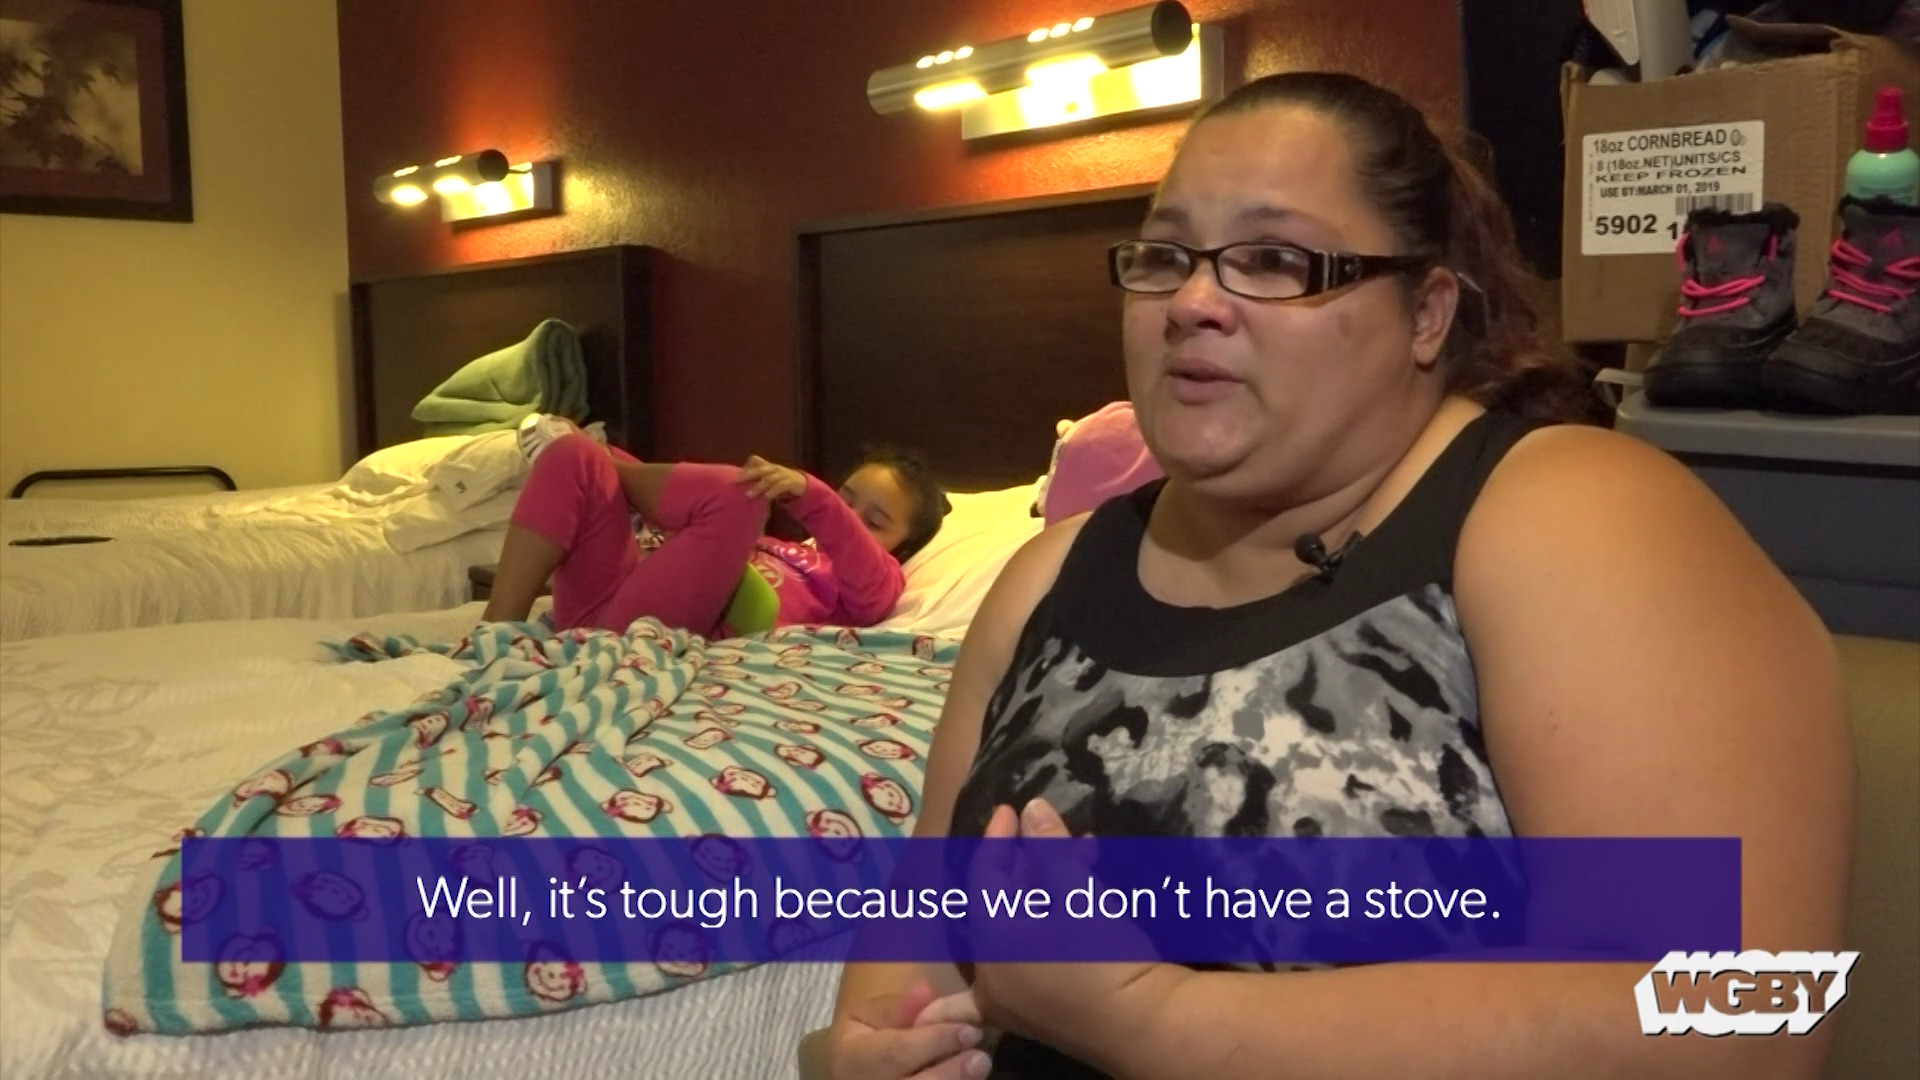 Hurricane Maria: One Family's New Life in Springfield / Una nueva vida familiar en Springfield